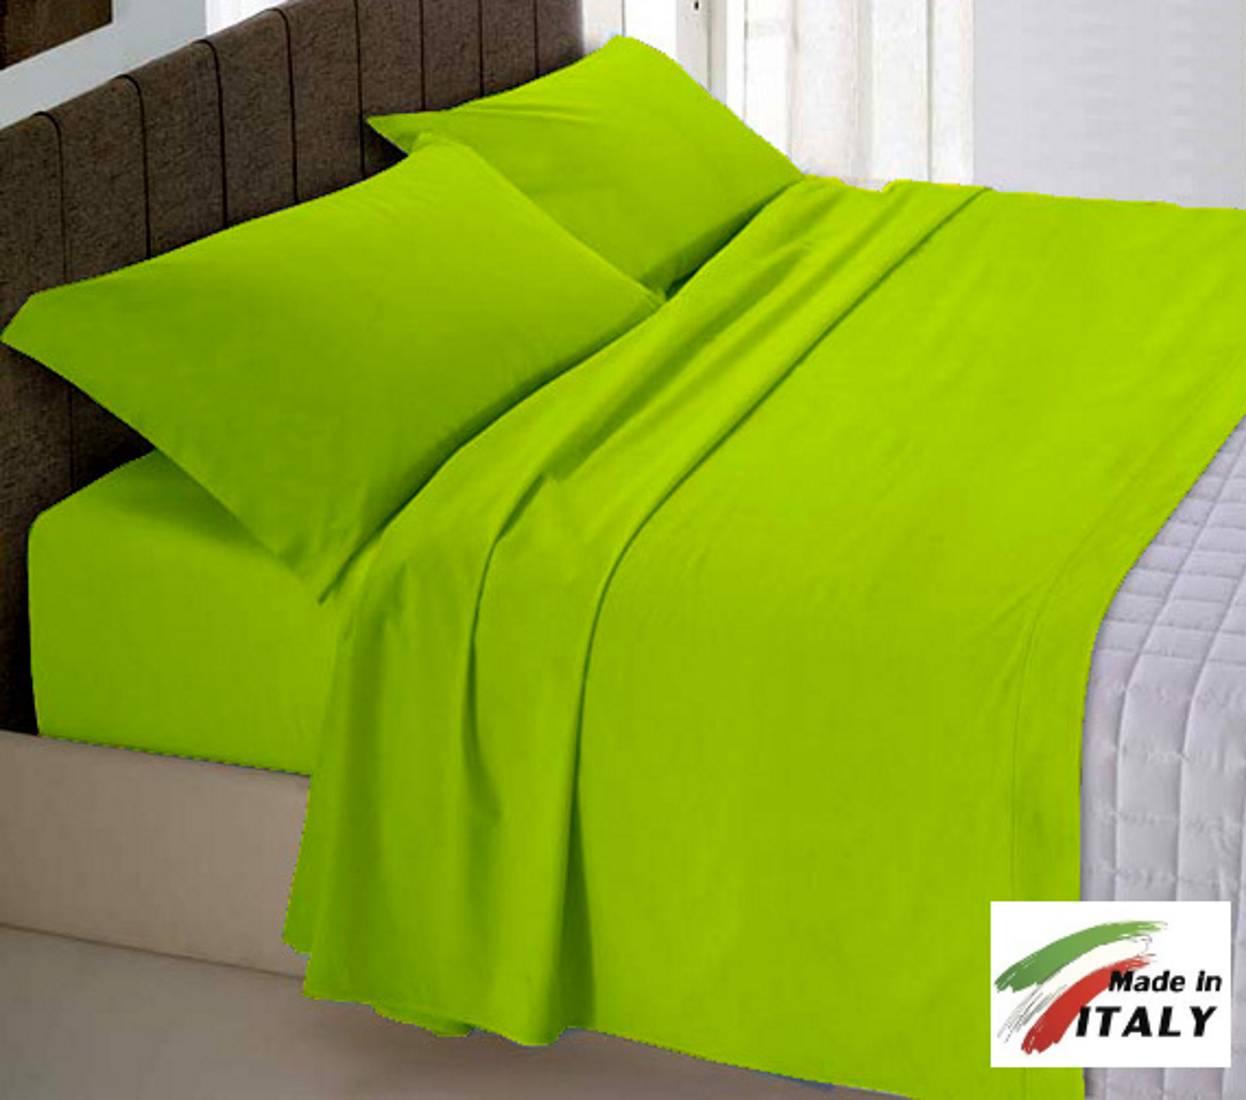 Copripiumino Verde Acido.Parure Copripiumino Made In Italy 100 Cotone Tinta Unita Verde Acido